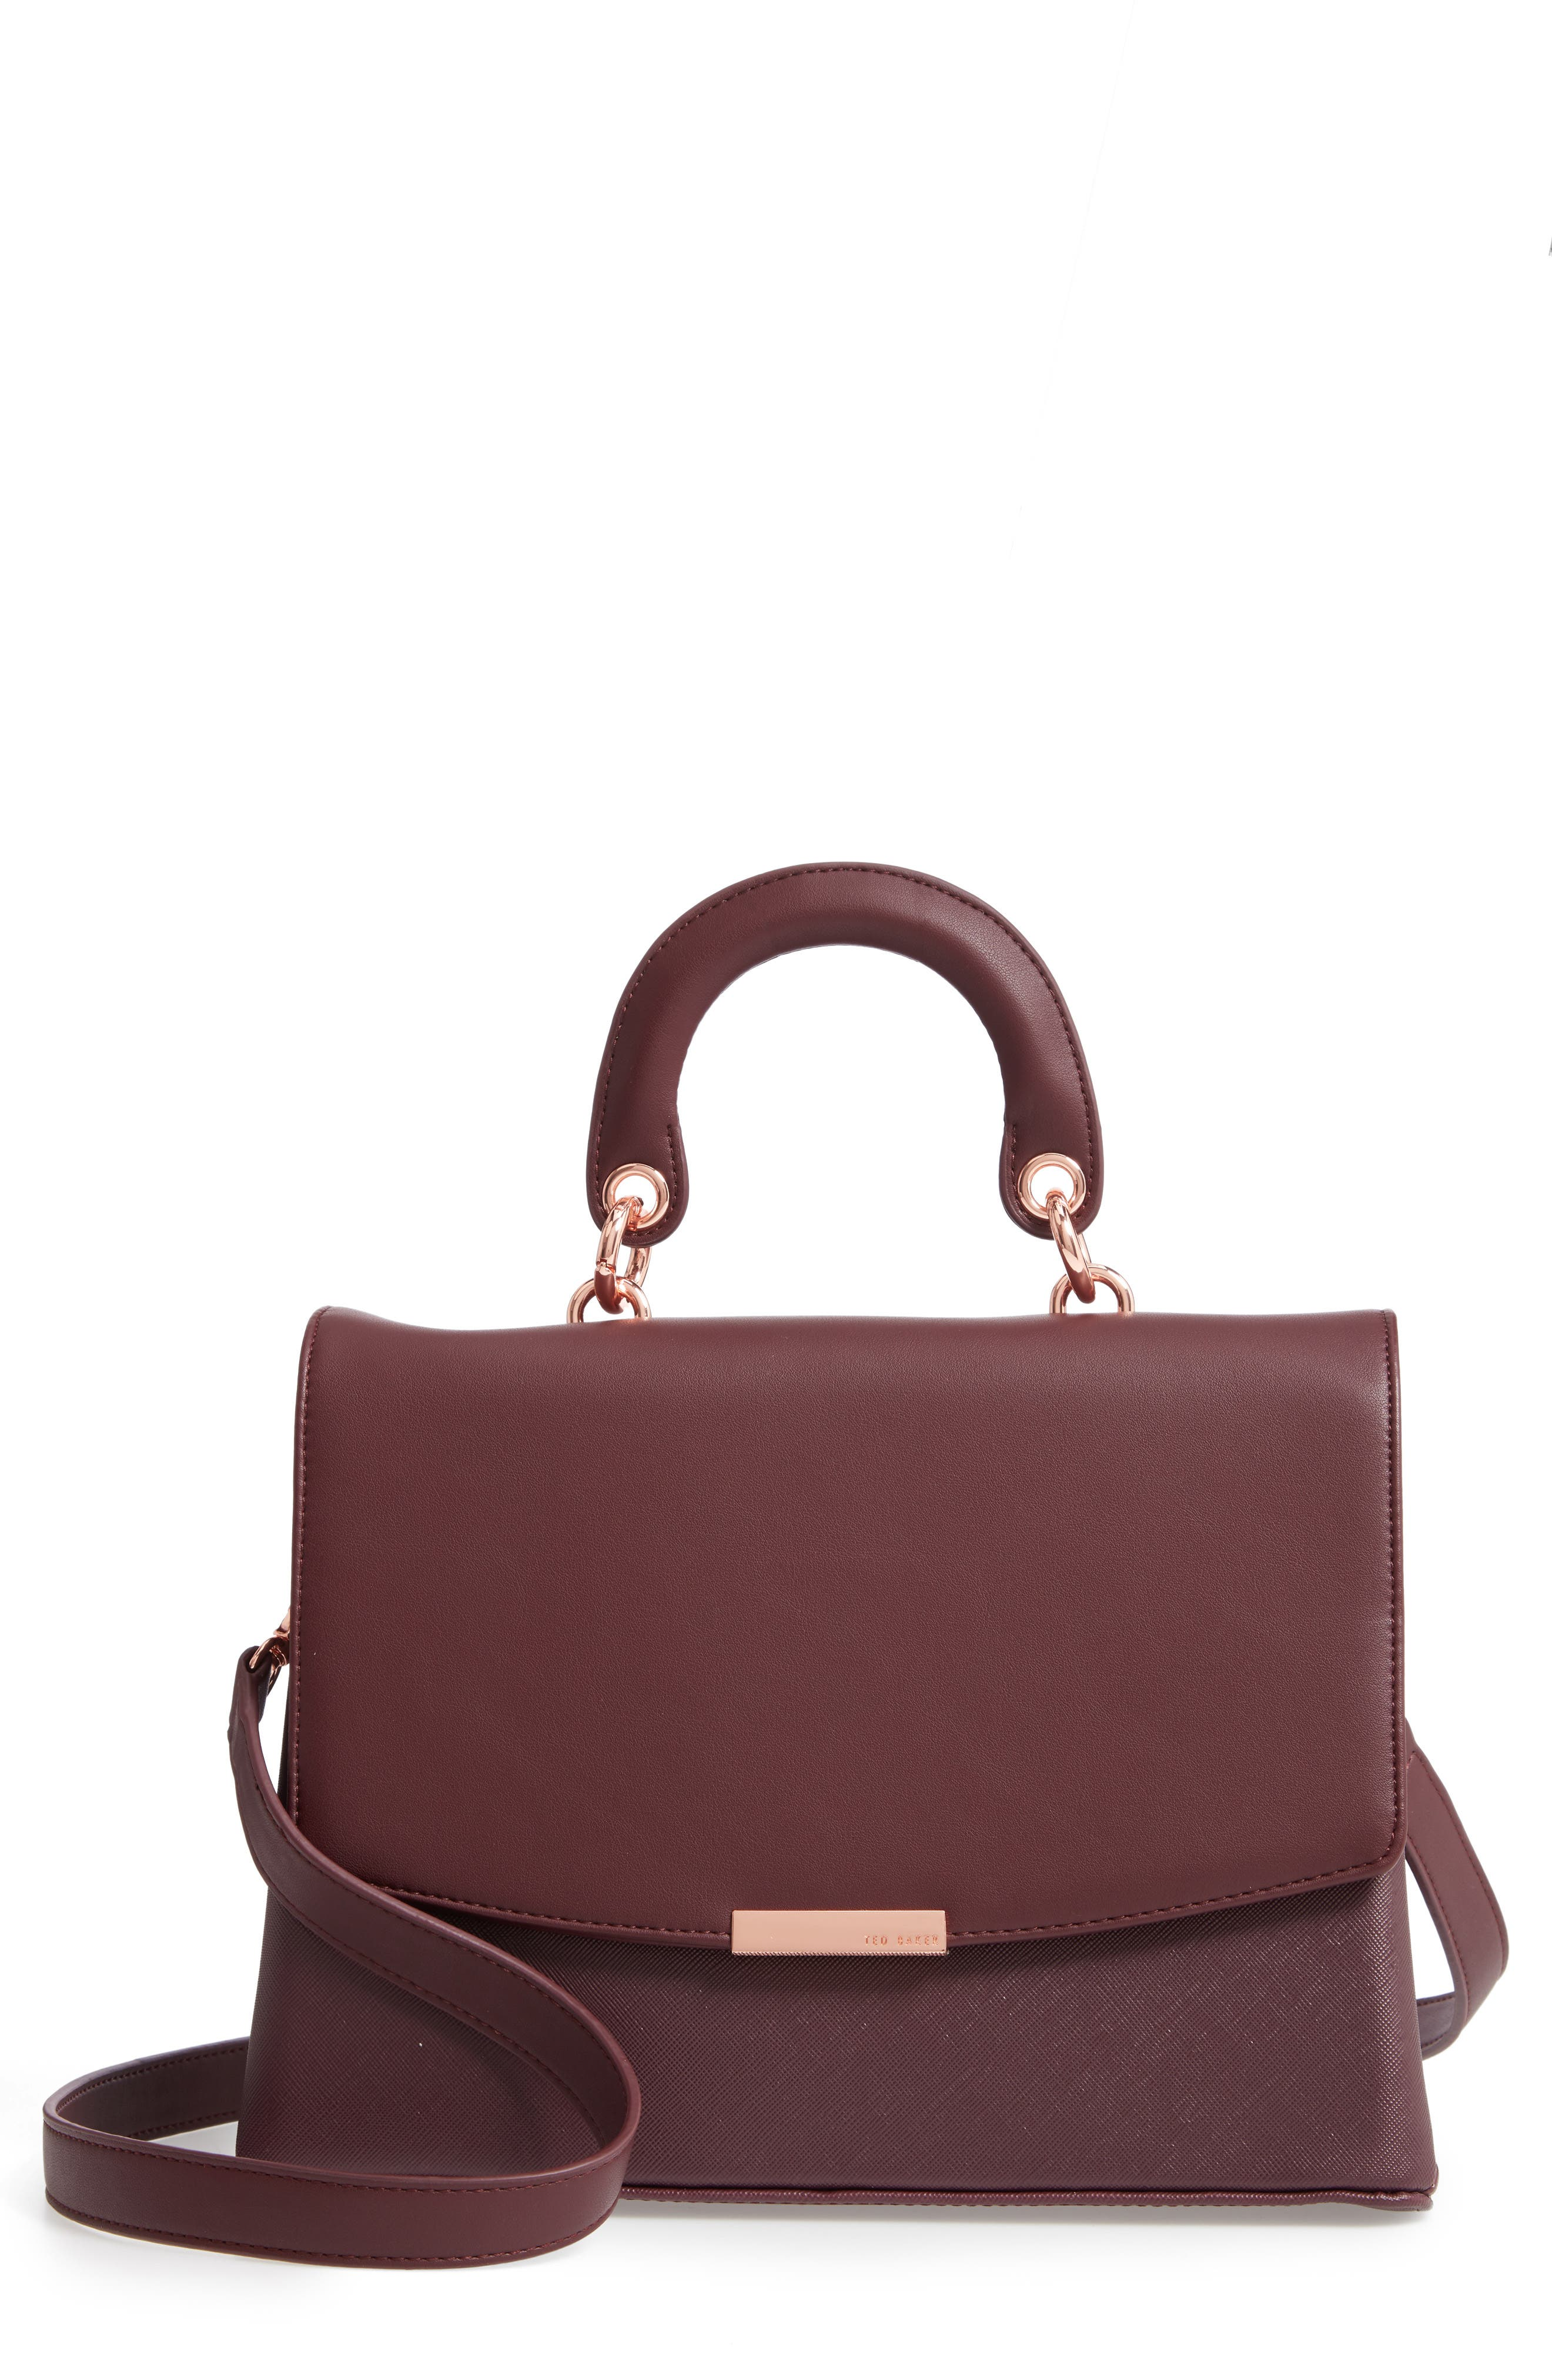 Keiira Lady Bag Faux Leather Top Handle Satchel,                             Main thumbnail 1, color,                             DEEP PURPLE